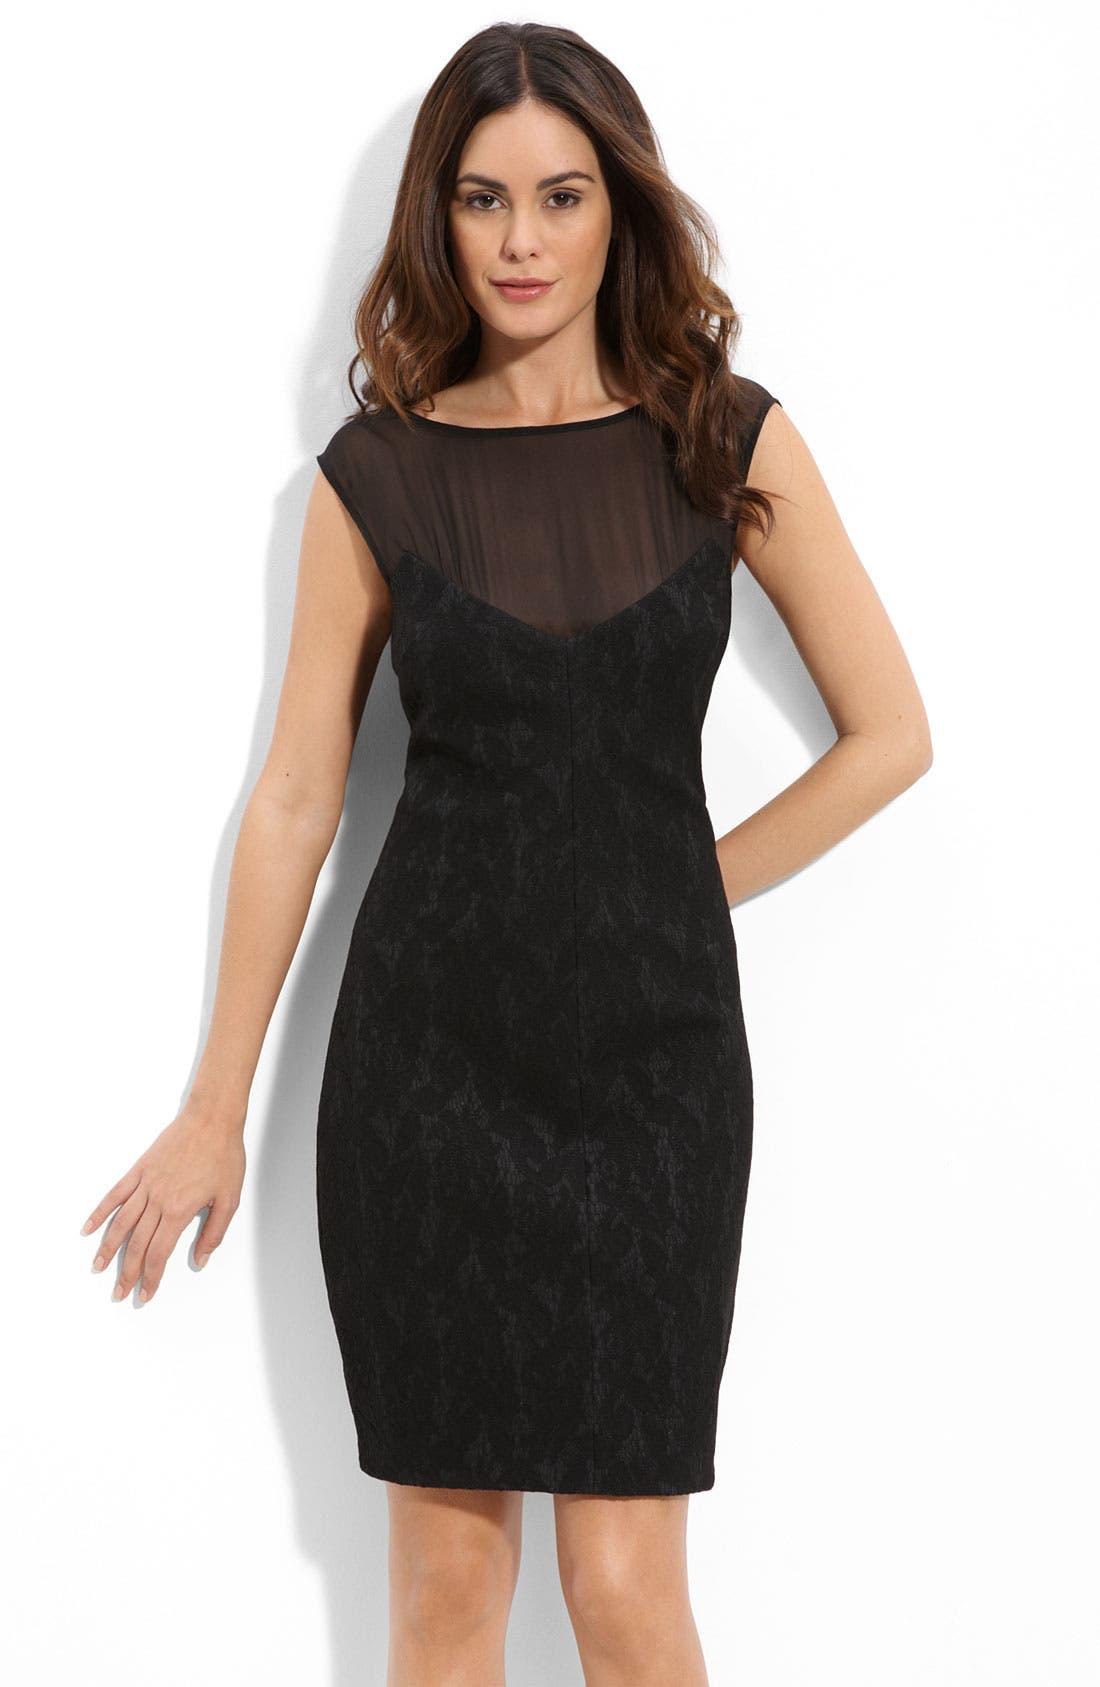 Alternate Image 1 Selected - Suzi Chin for Maggy Boutique Illusion Bodice Lace Sheath Dress (Petite)